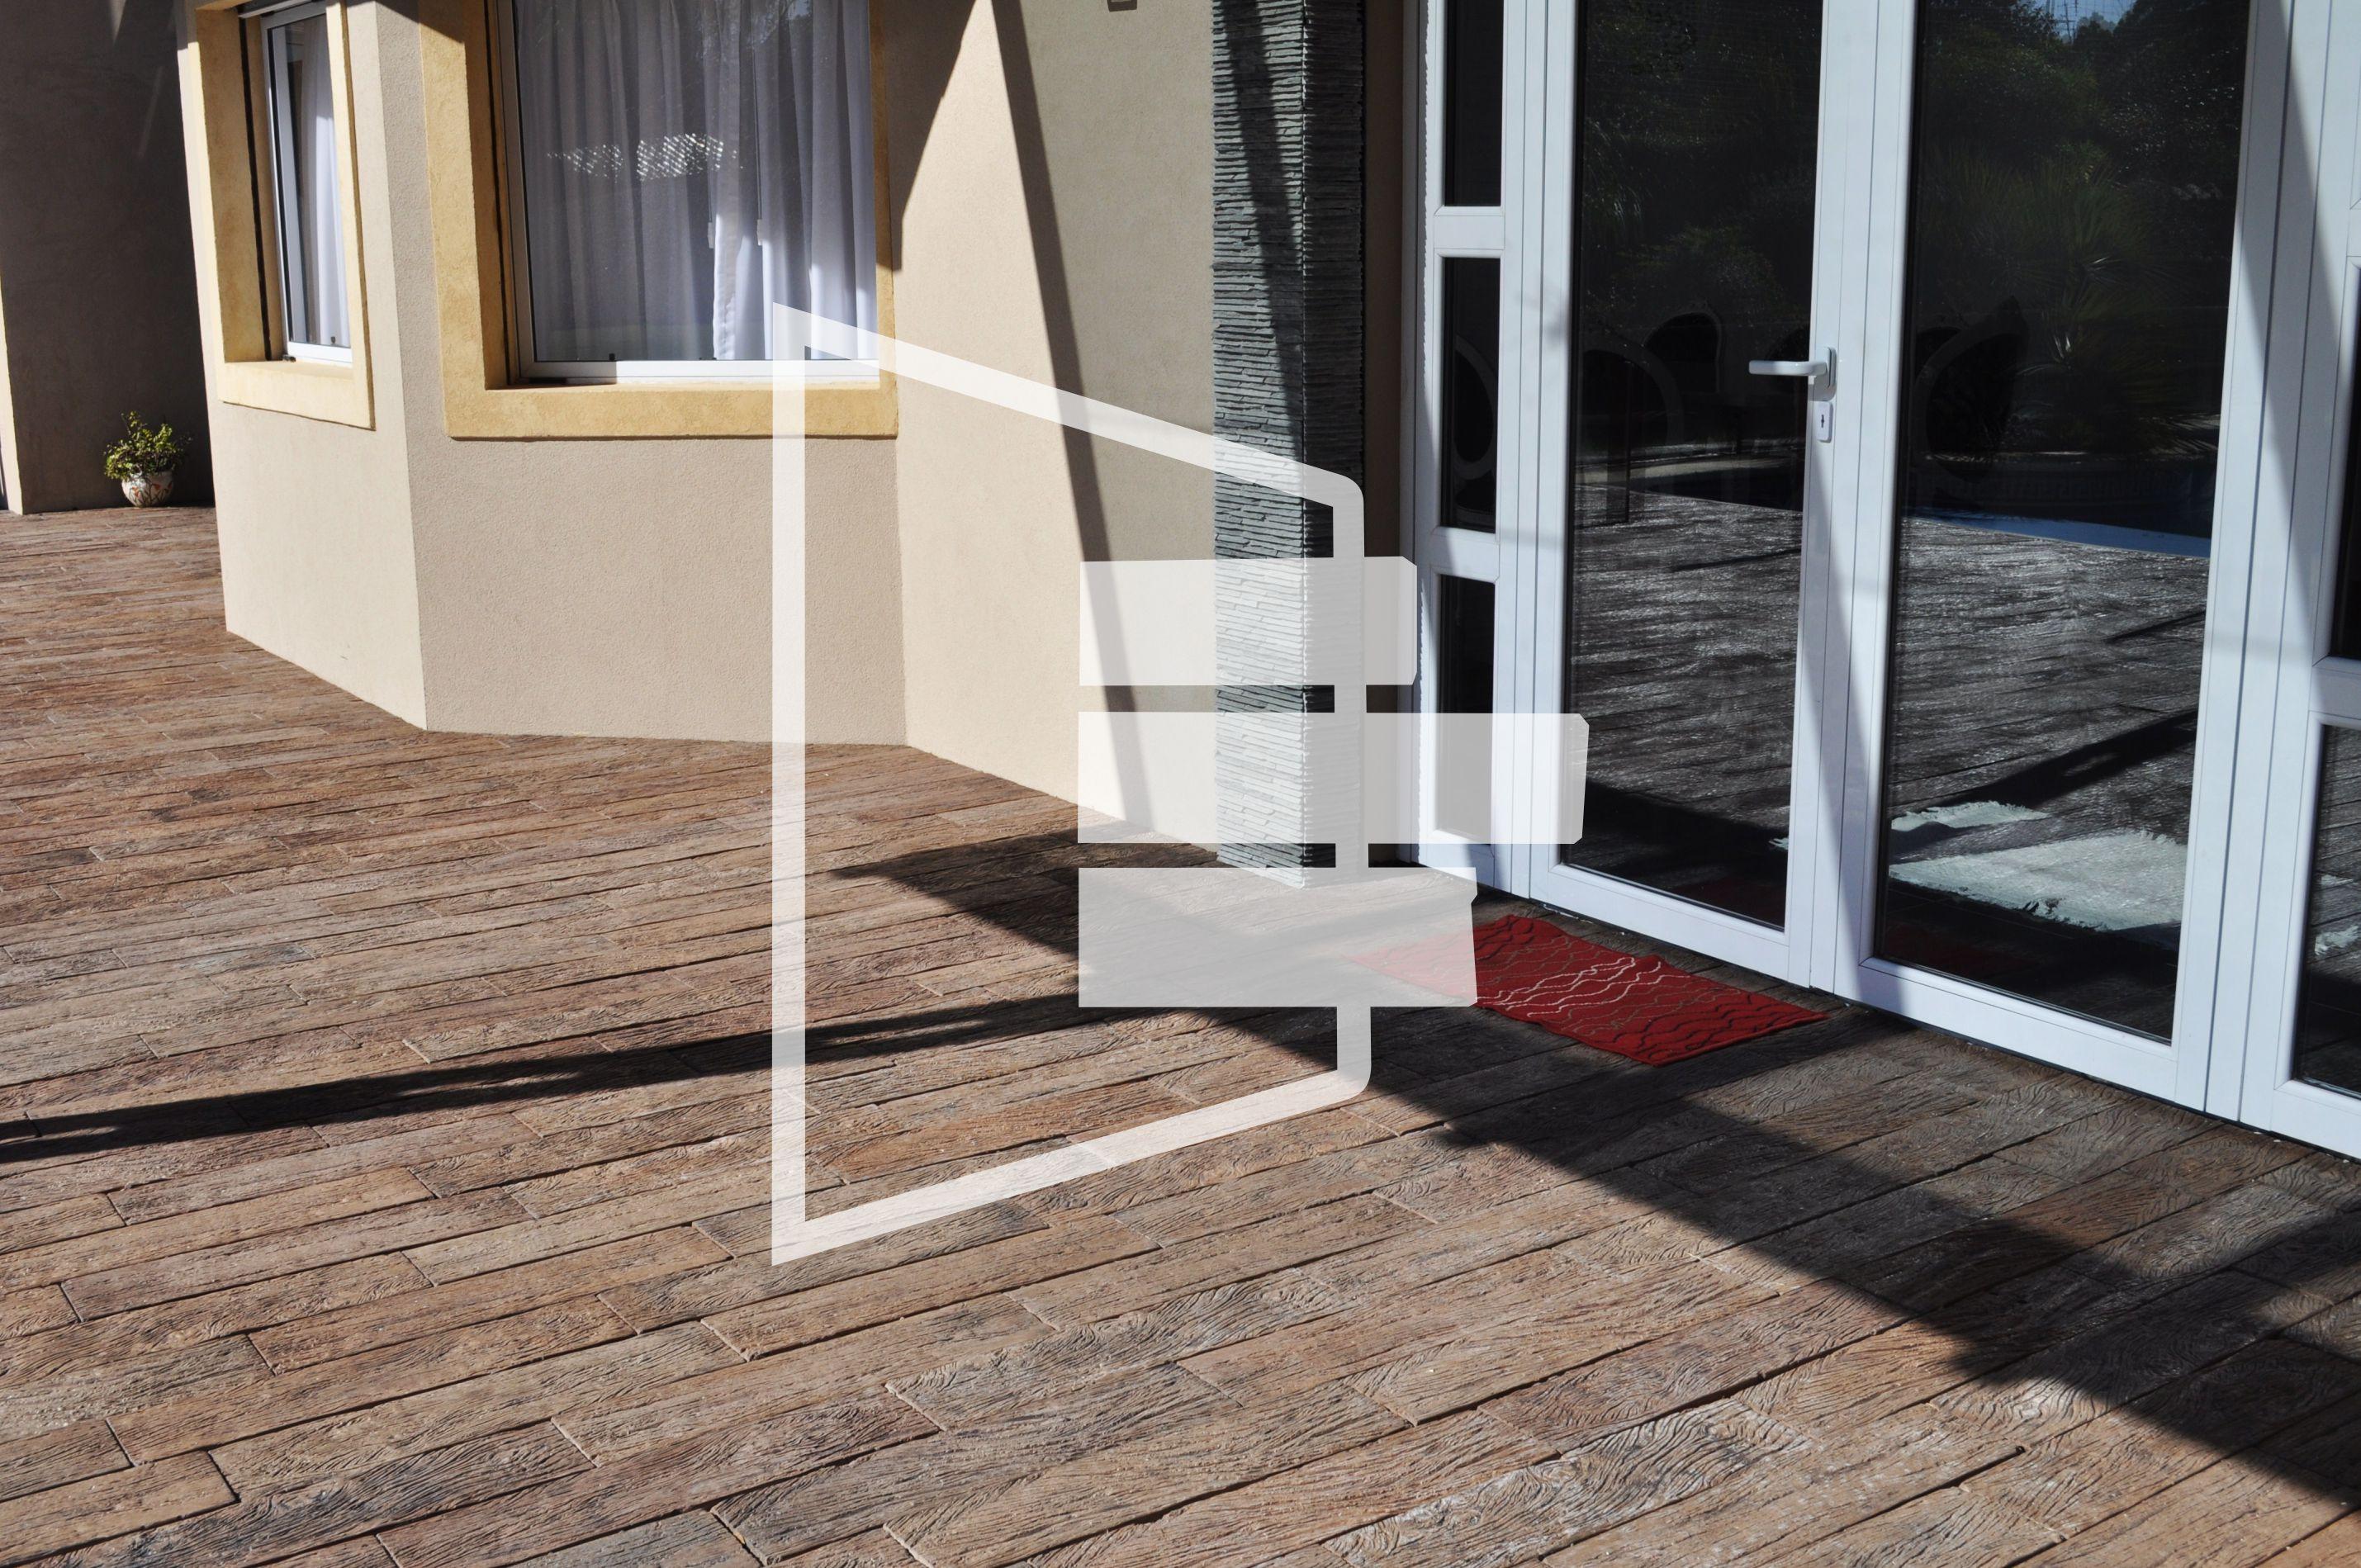 Revesimientos cementicios simil madera para exteriores pirka stone tradem style - Revestimientos de exteriores ...